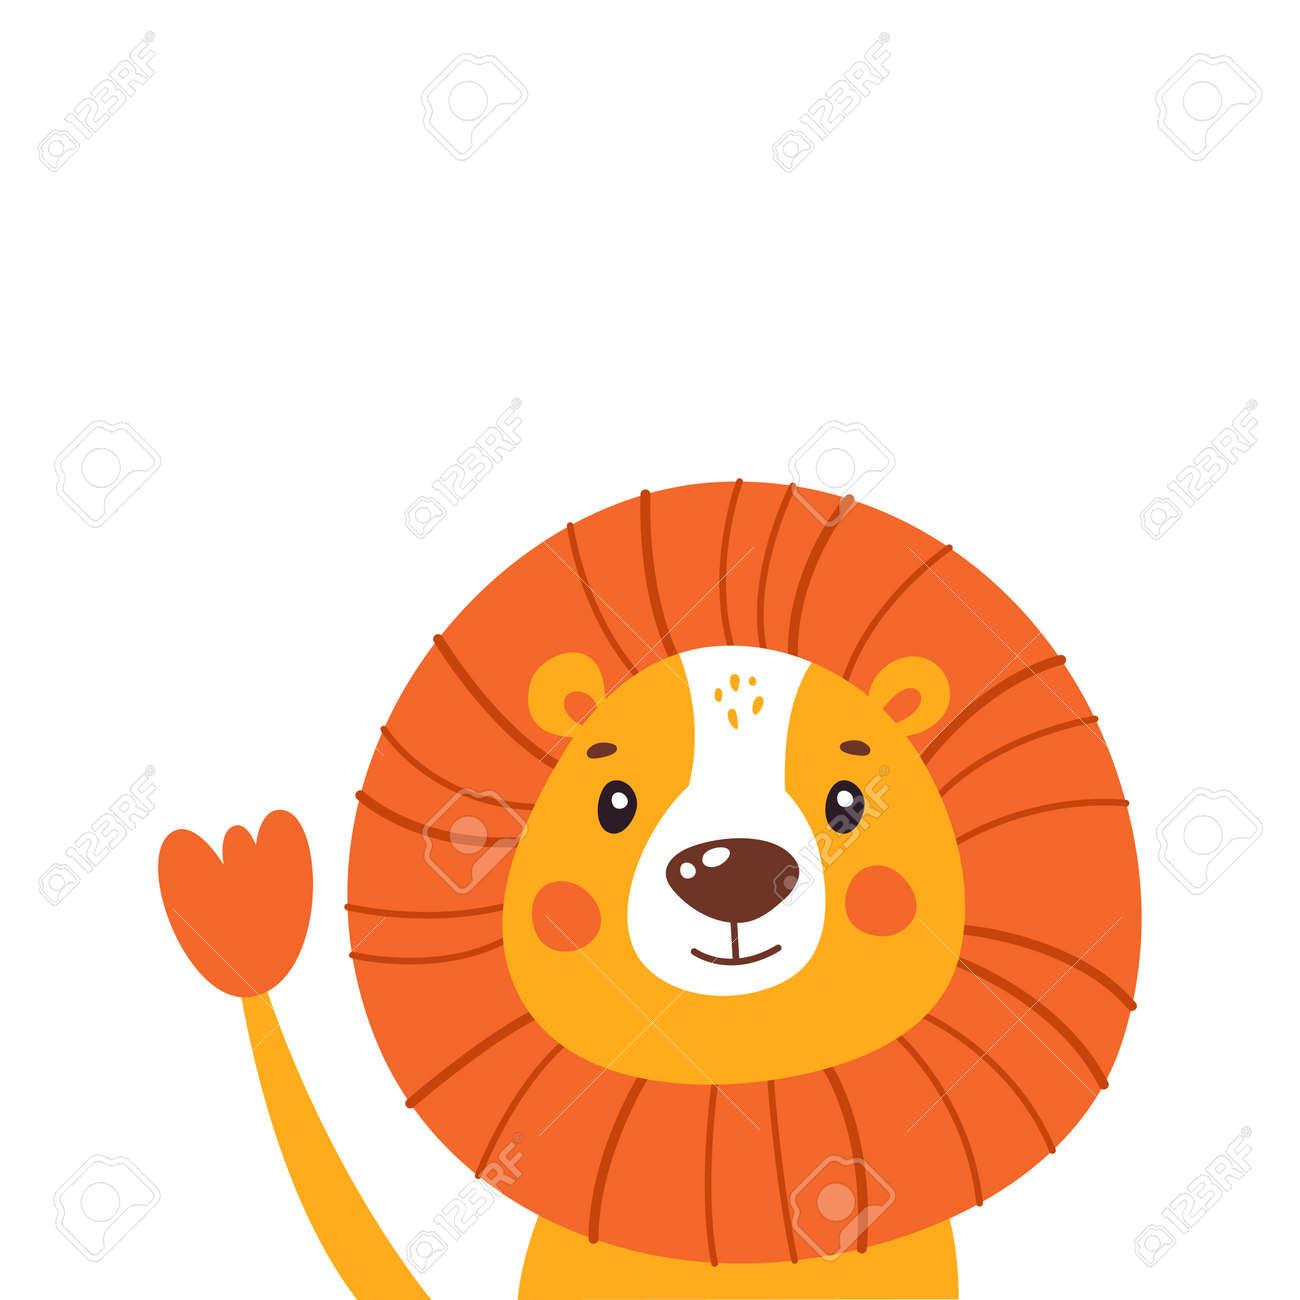 Cartoon happy lion isolated on white background. Vector illustration. - 169771677